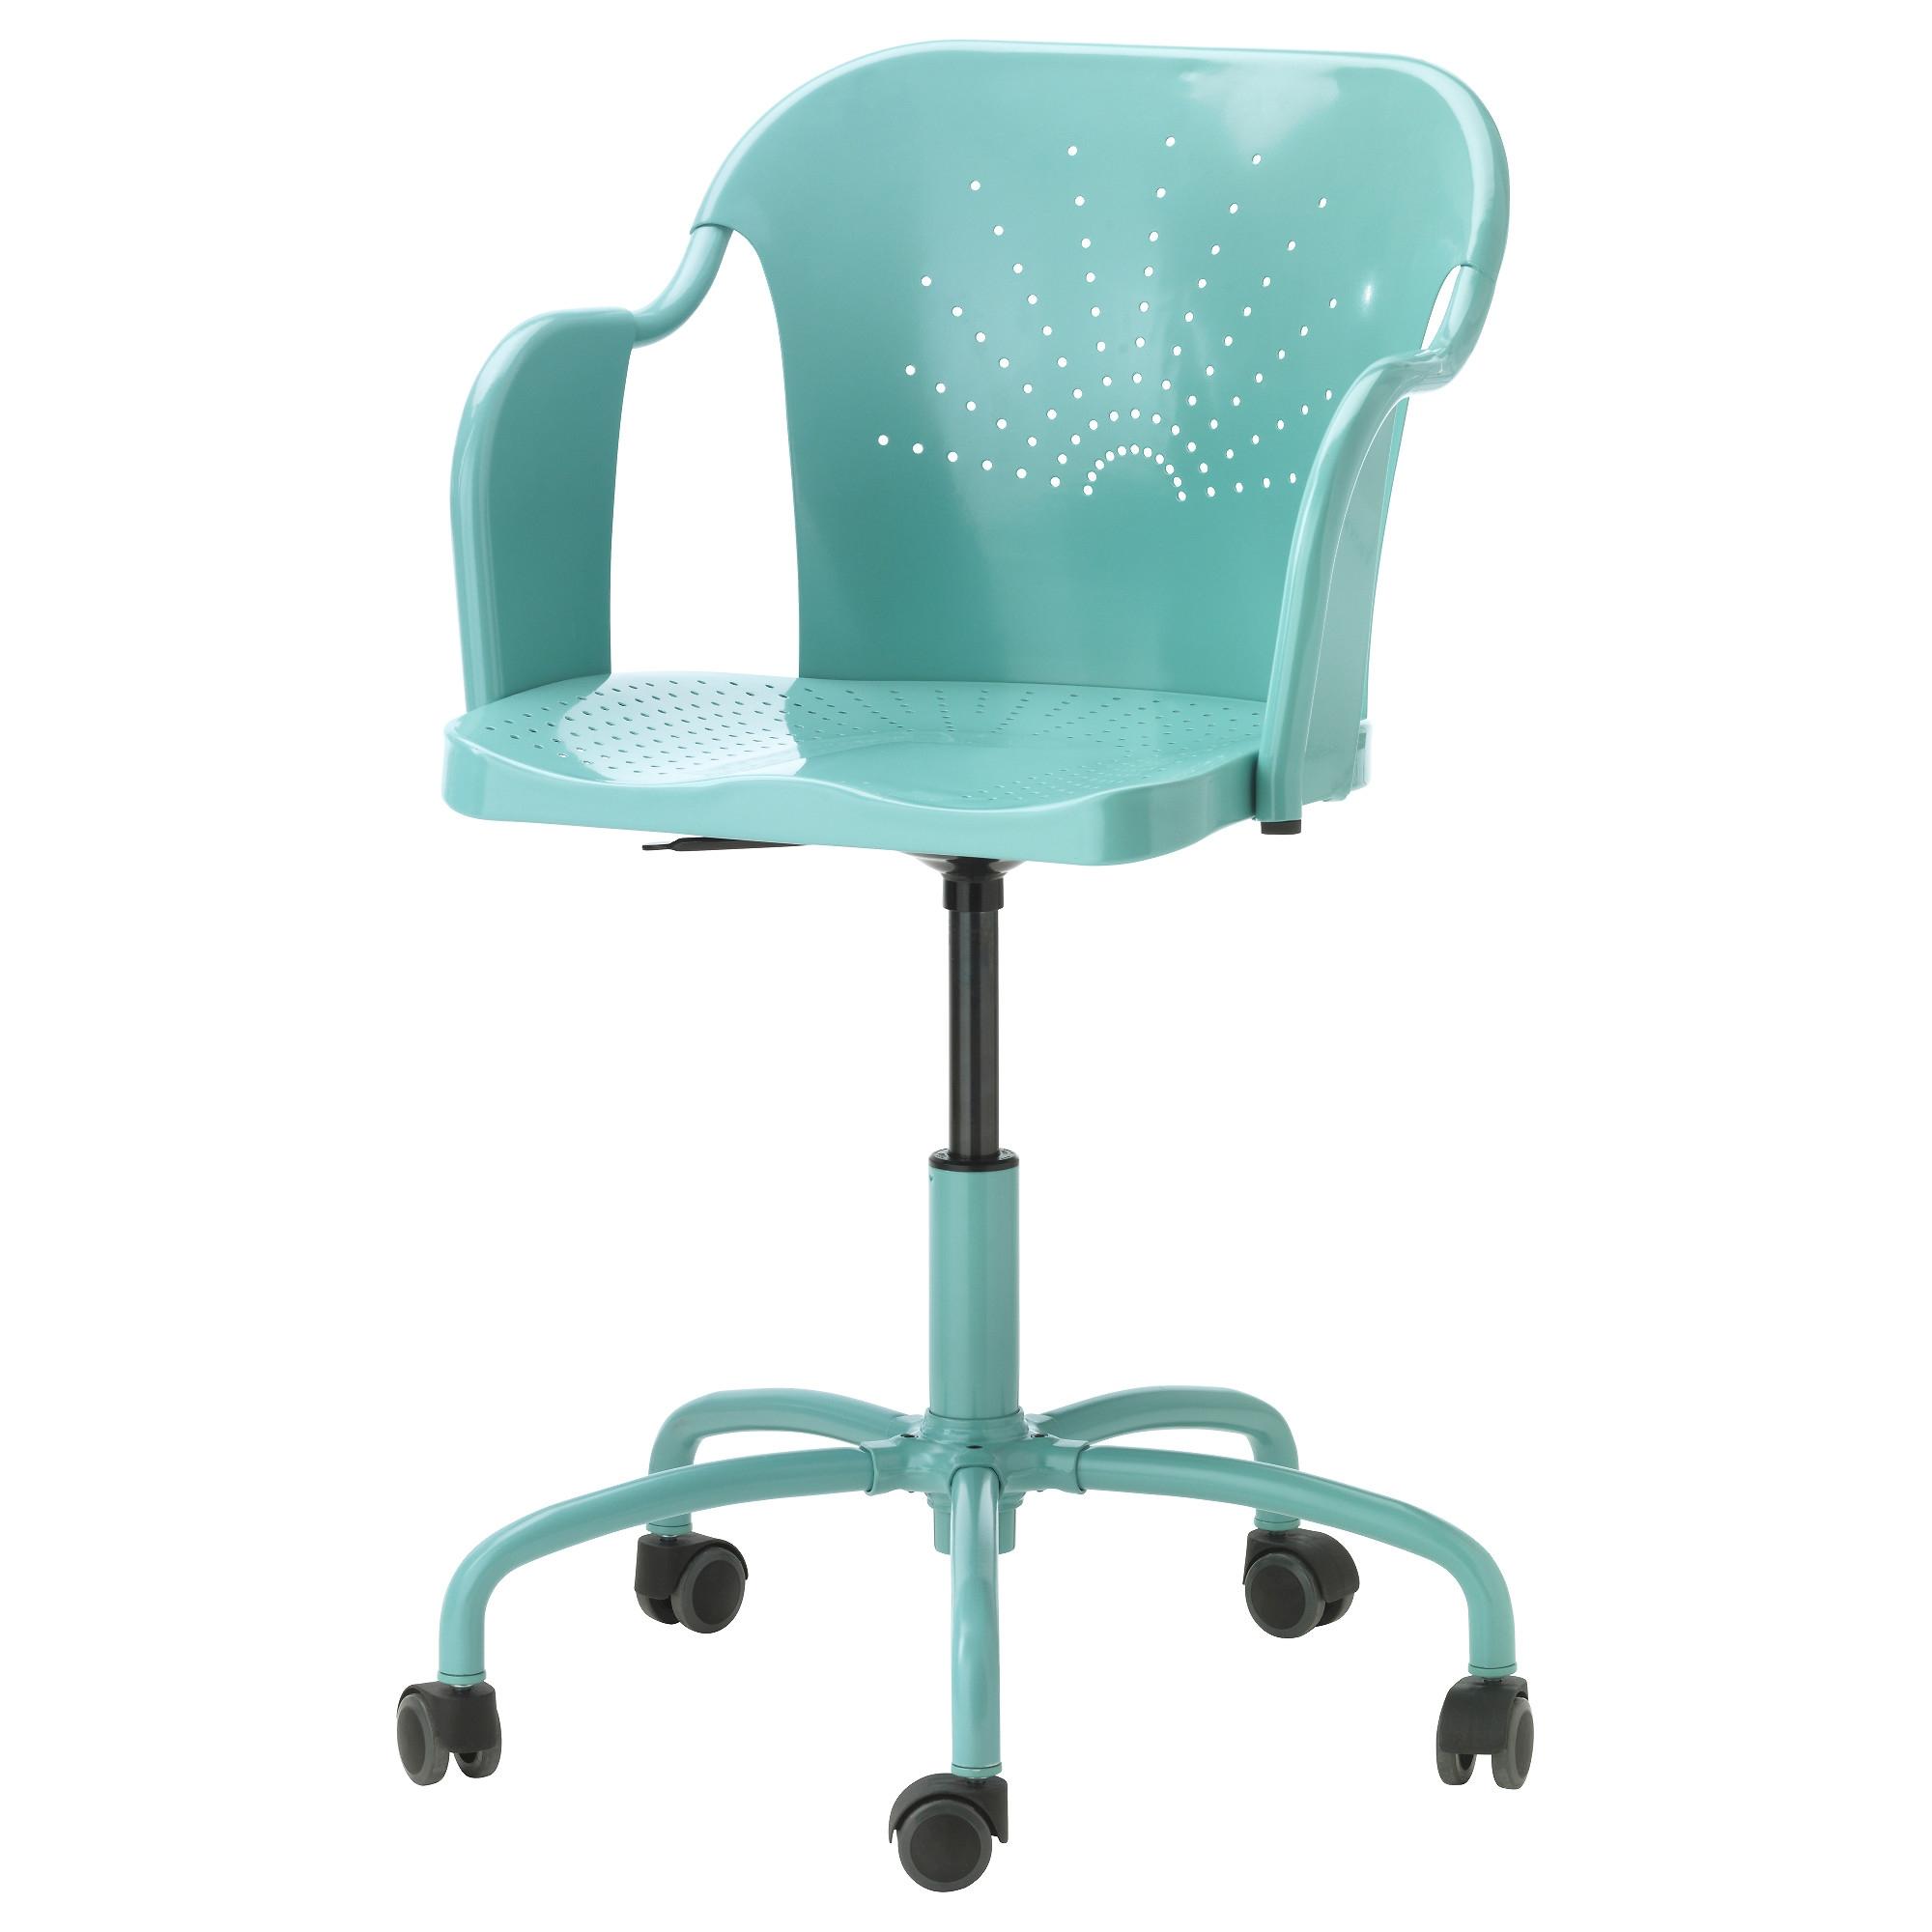 Roberget silla giratoria - Sillas trabajo ikea ...